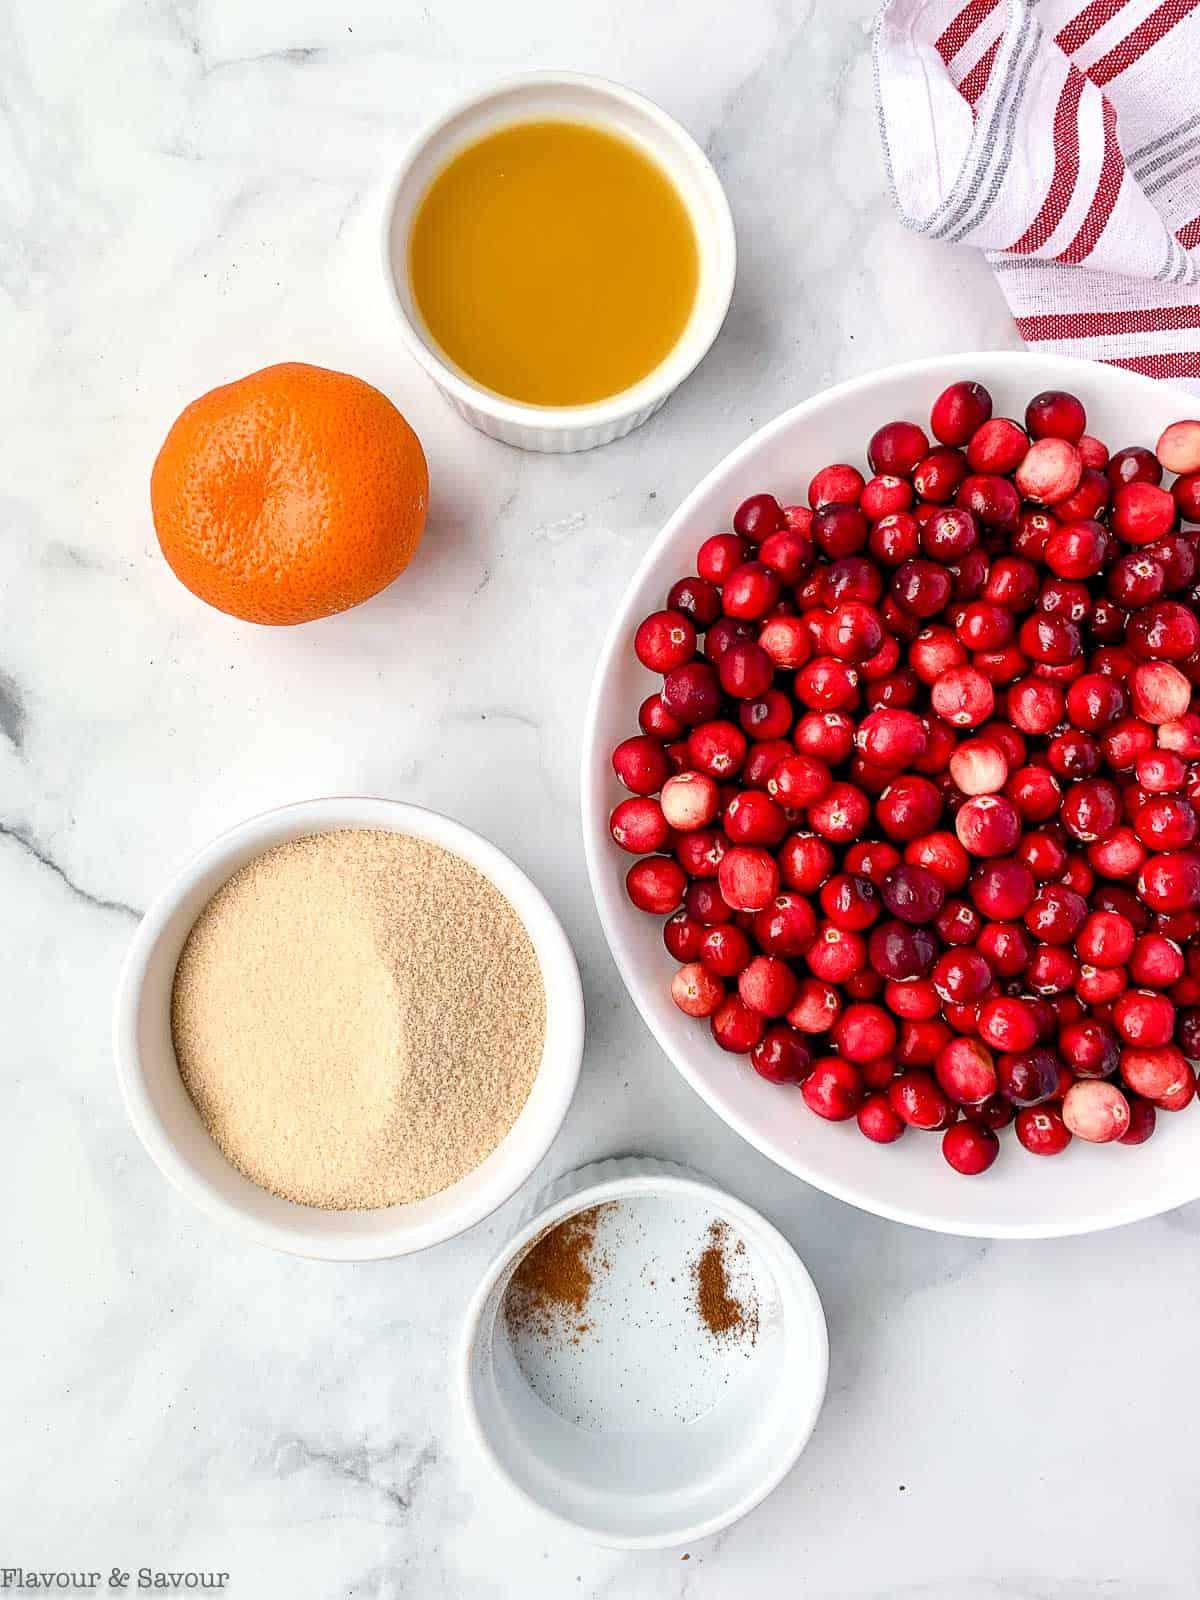 Ingredients for Sugar-Free Cranberry Orange Sauce